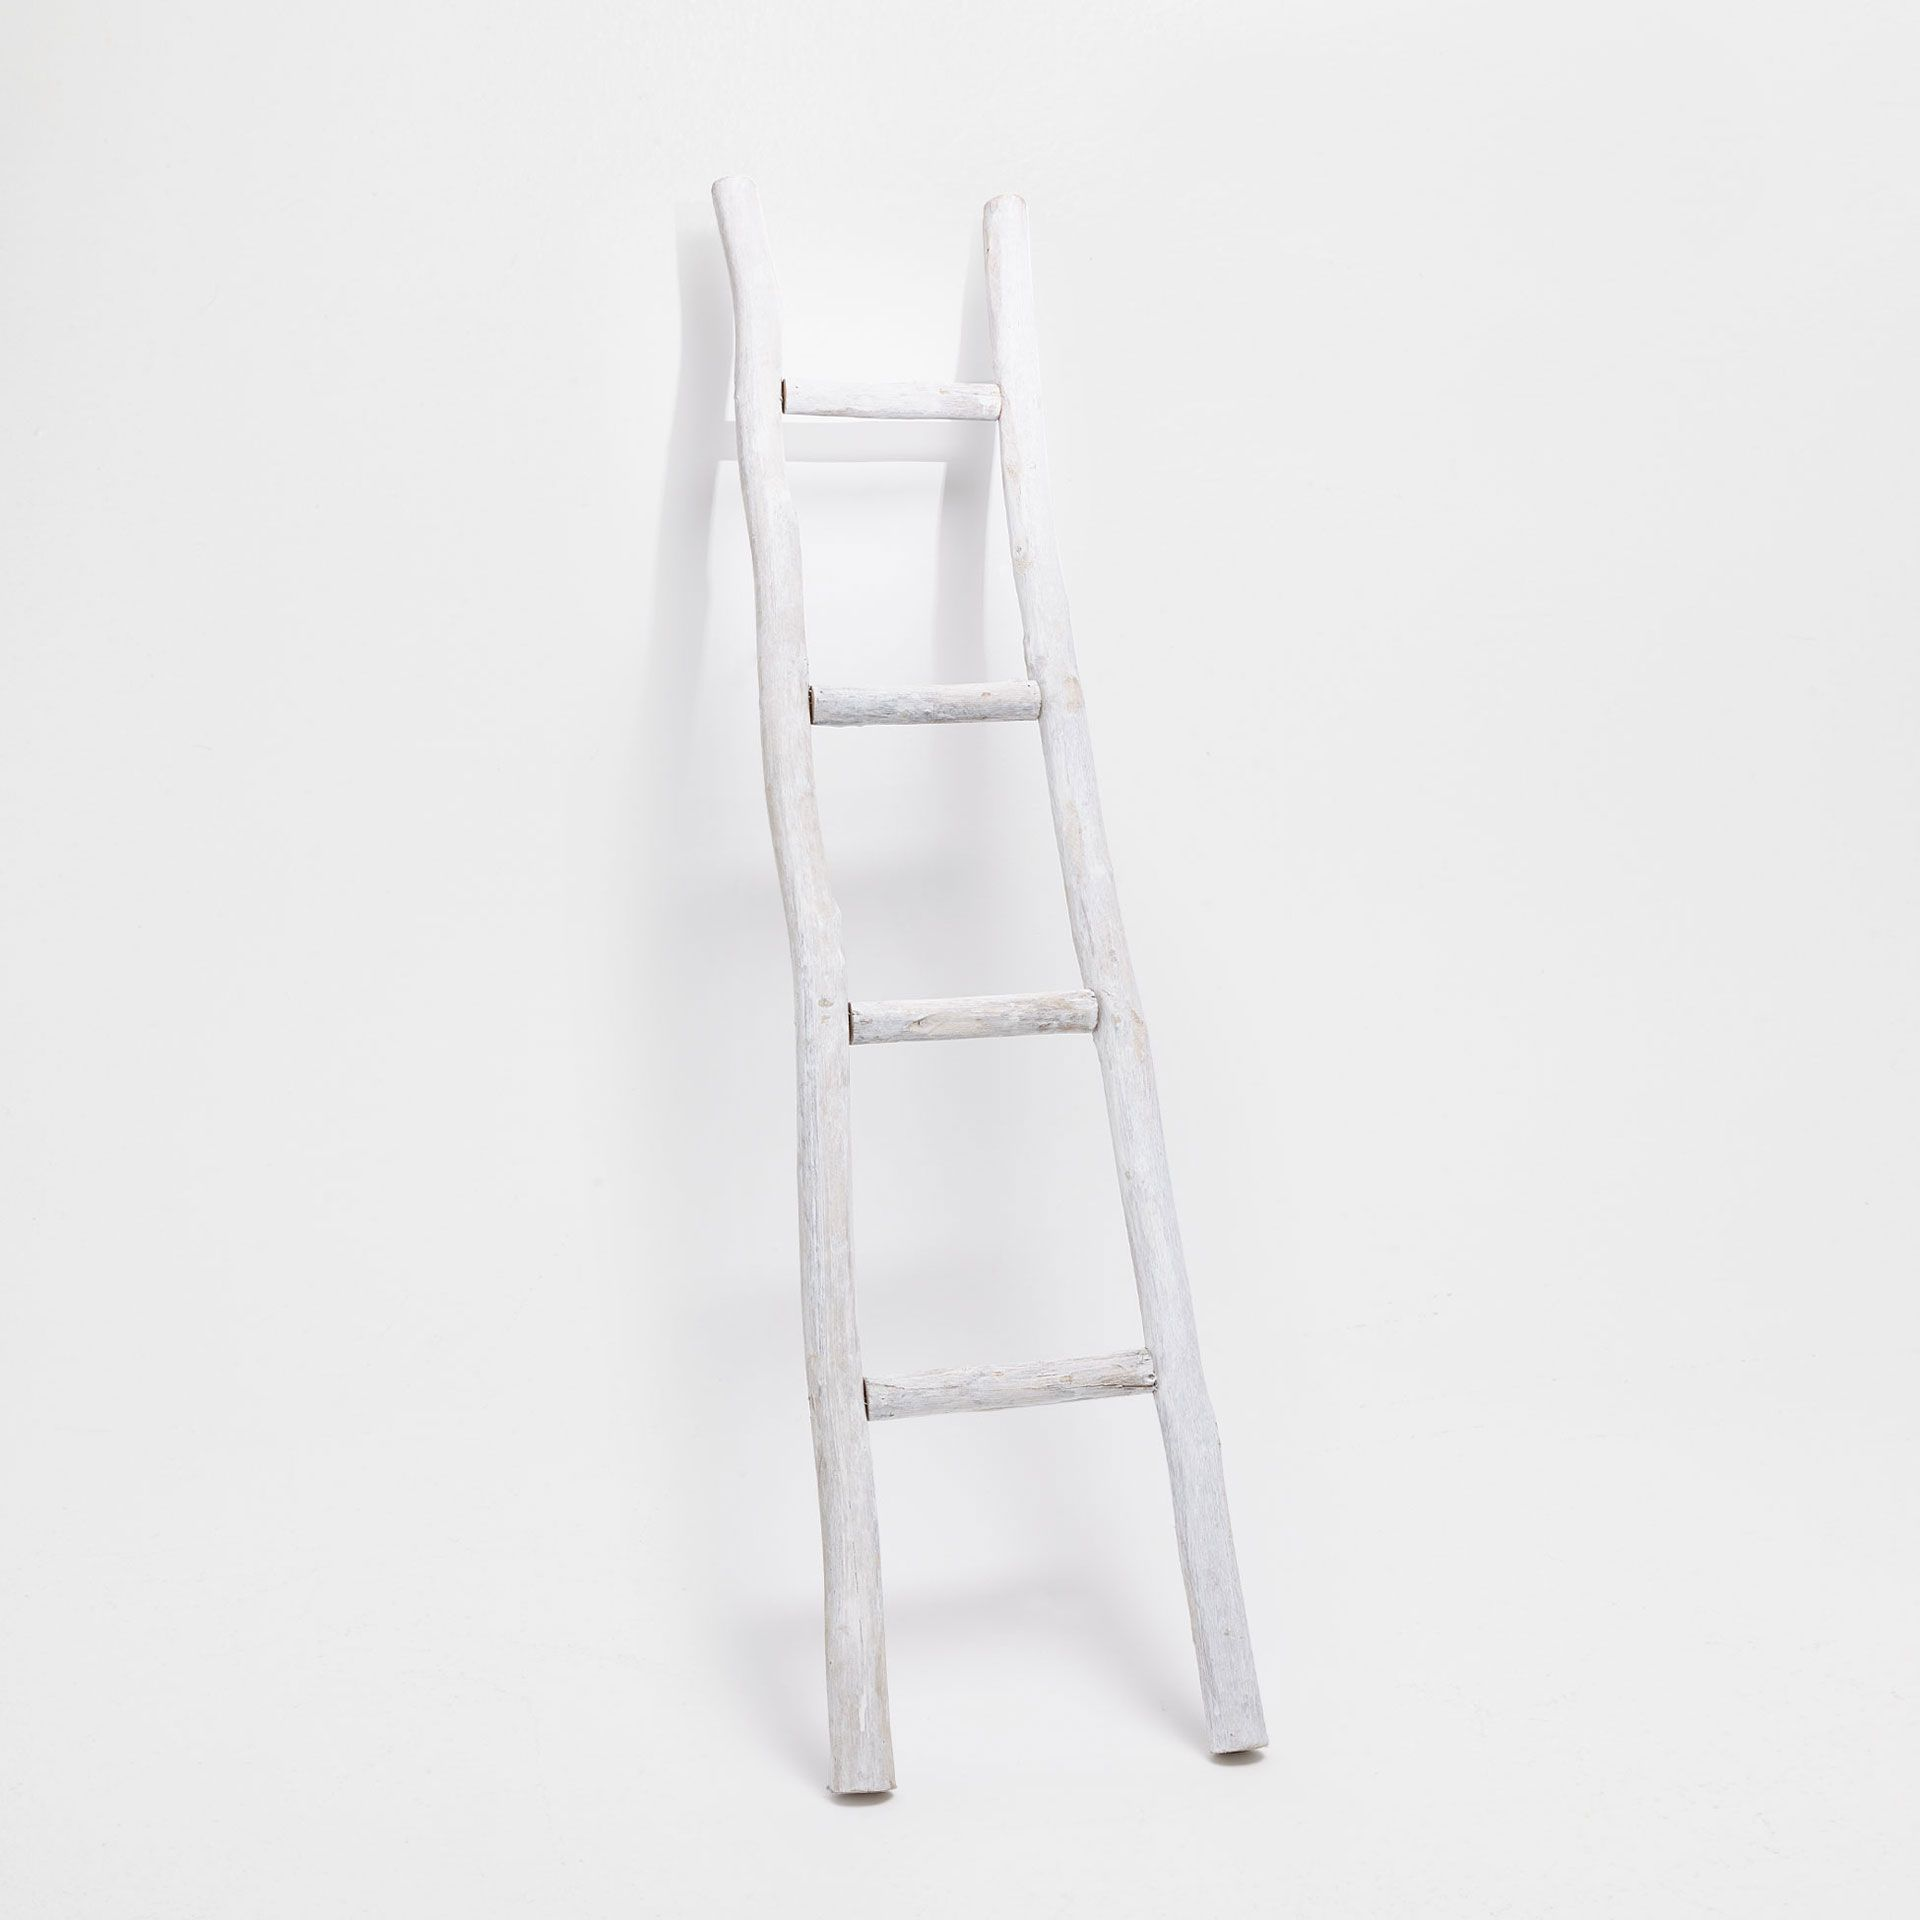 Image 1 of the product Ladder-shaped towel rack | Marlborough ...